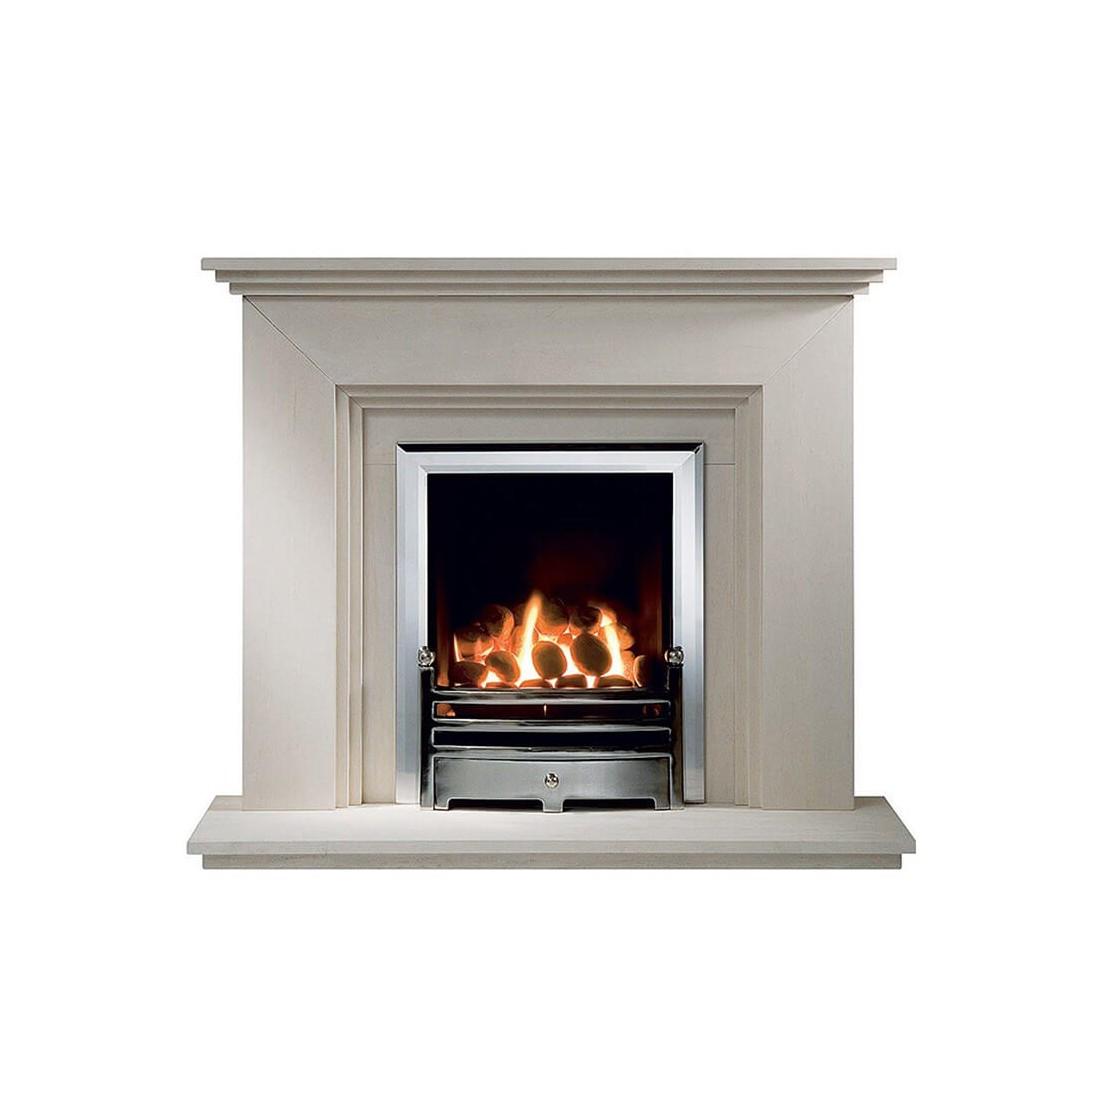 Cranbourne Limestone Fireplace Suite With Electric Firefirelandcouk